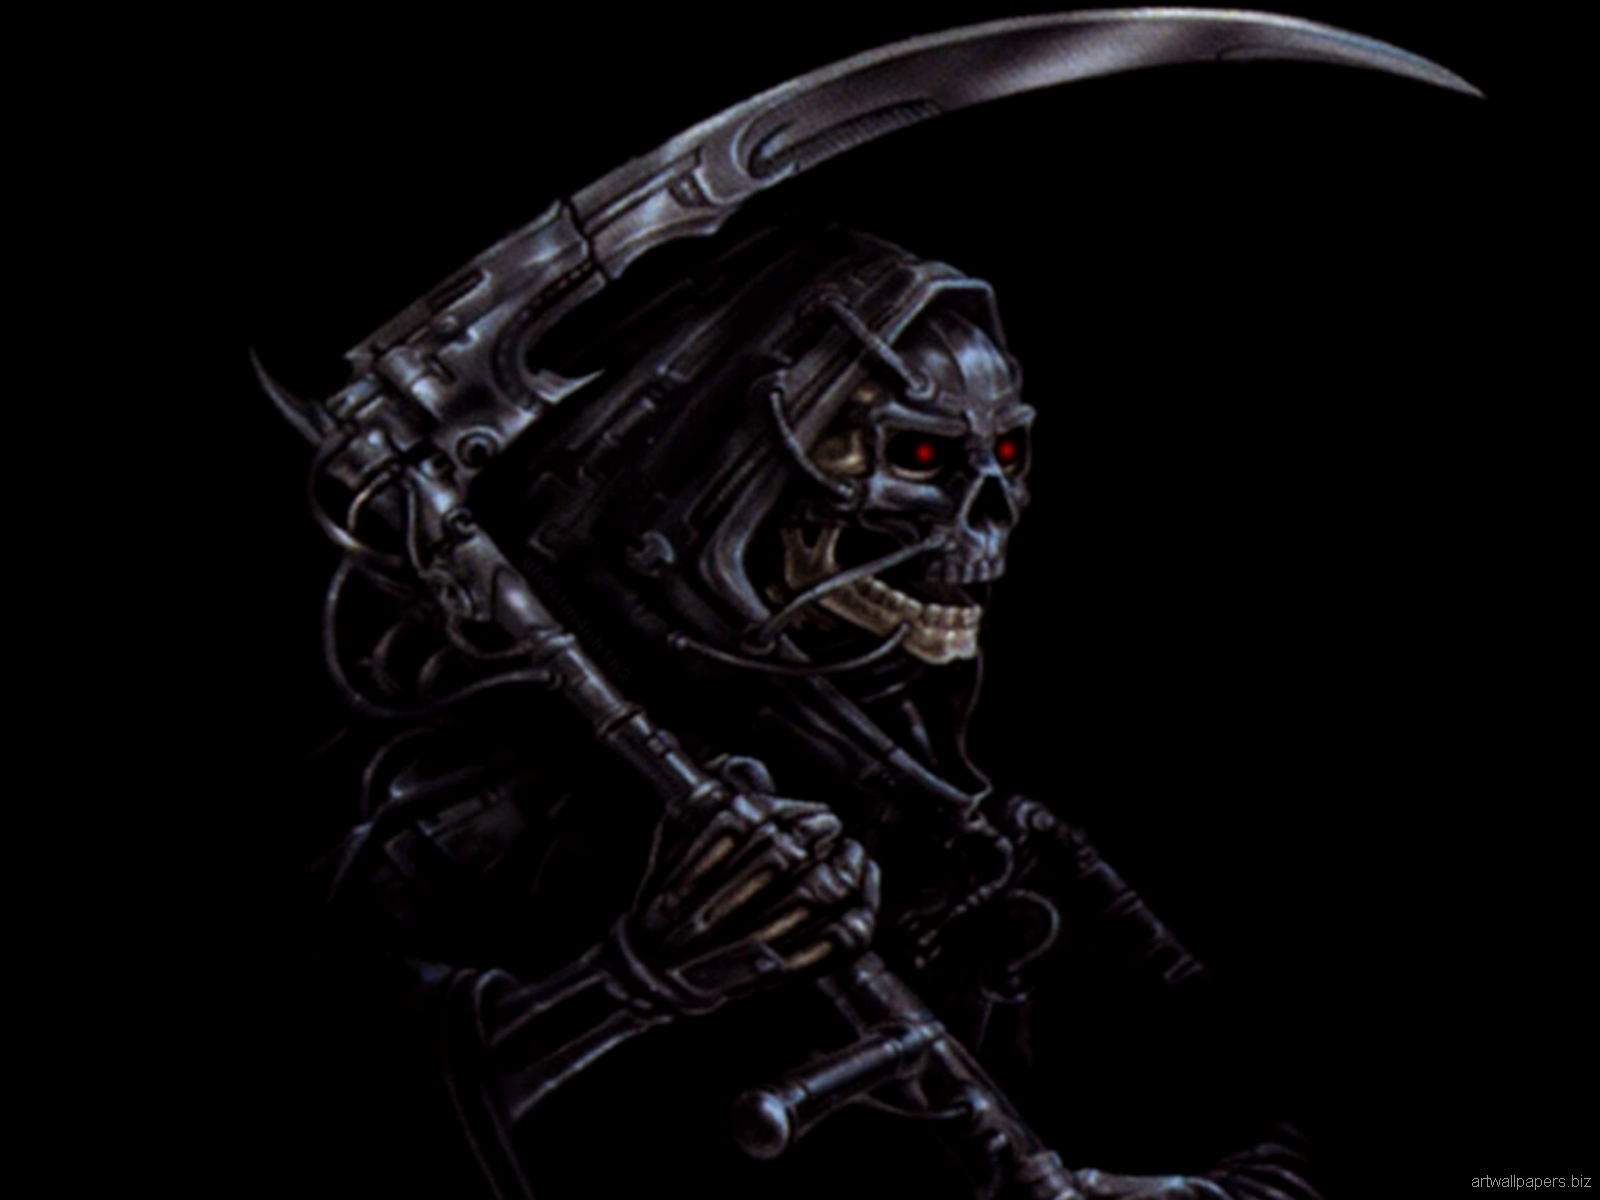 Badass Skull Wallpaper - WallpaperSafari